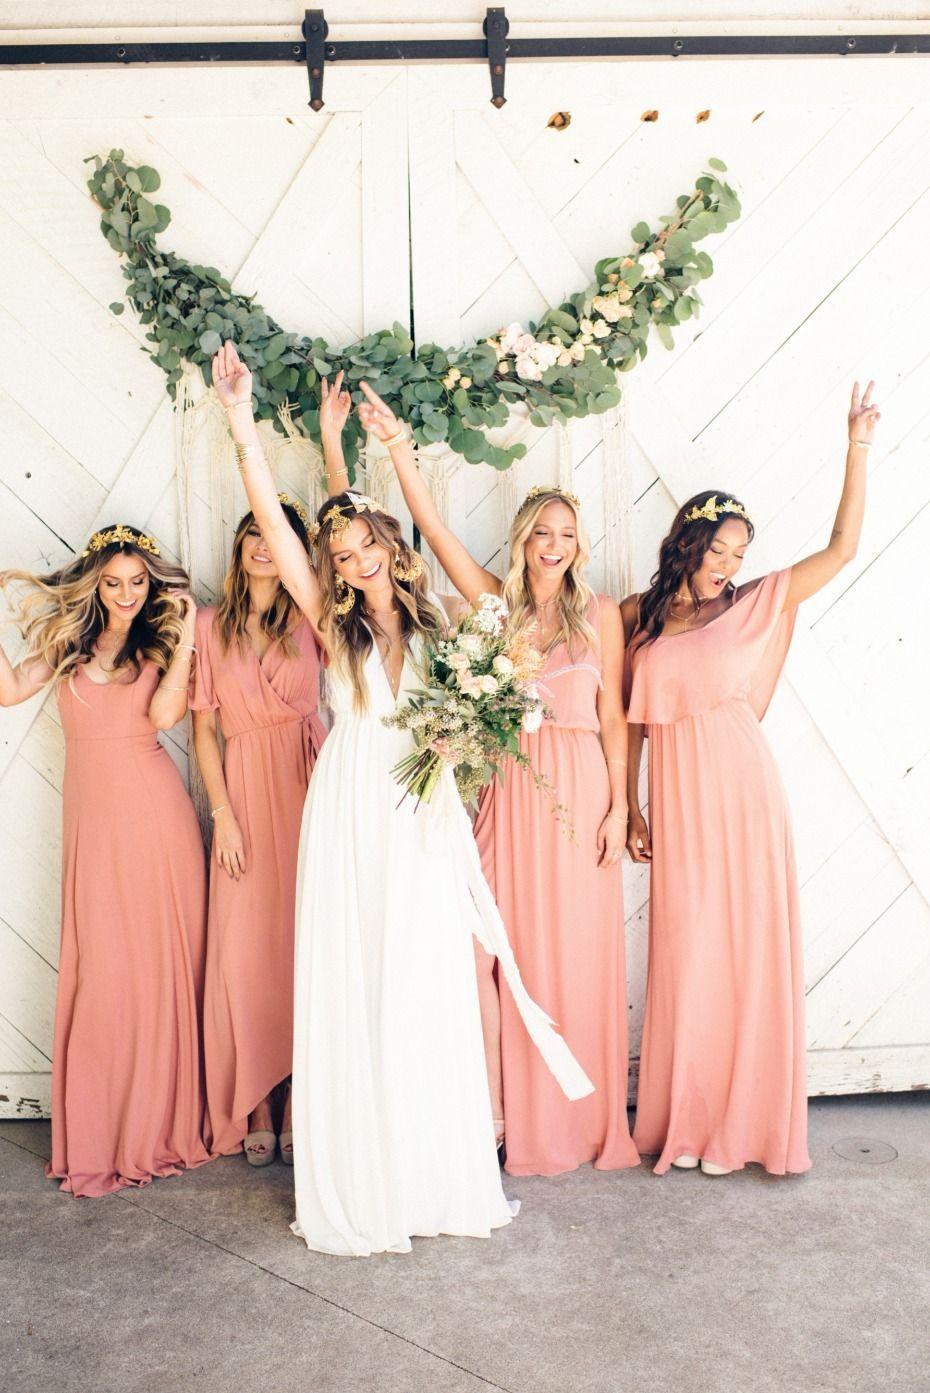 Bridesmaid Etiquette What Not To Do Peach Bridesmaid Dresses Coral Bridesmaid Dresses Summer Bridesmaid Dresses [ 1393 x 930 Pixel ]